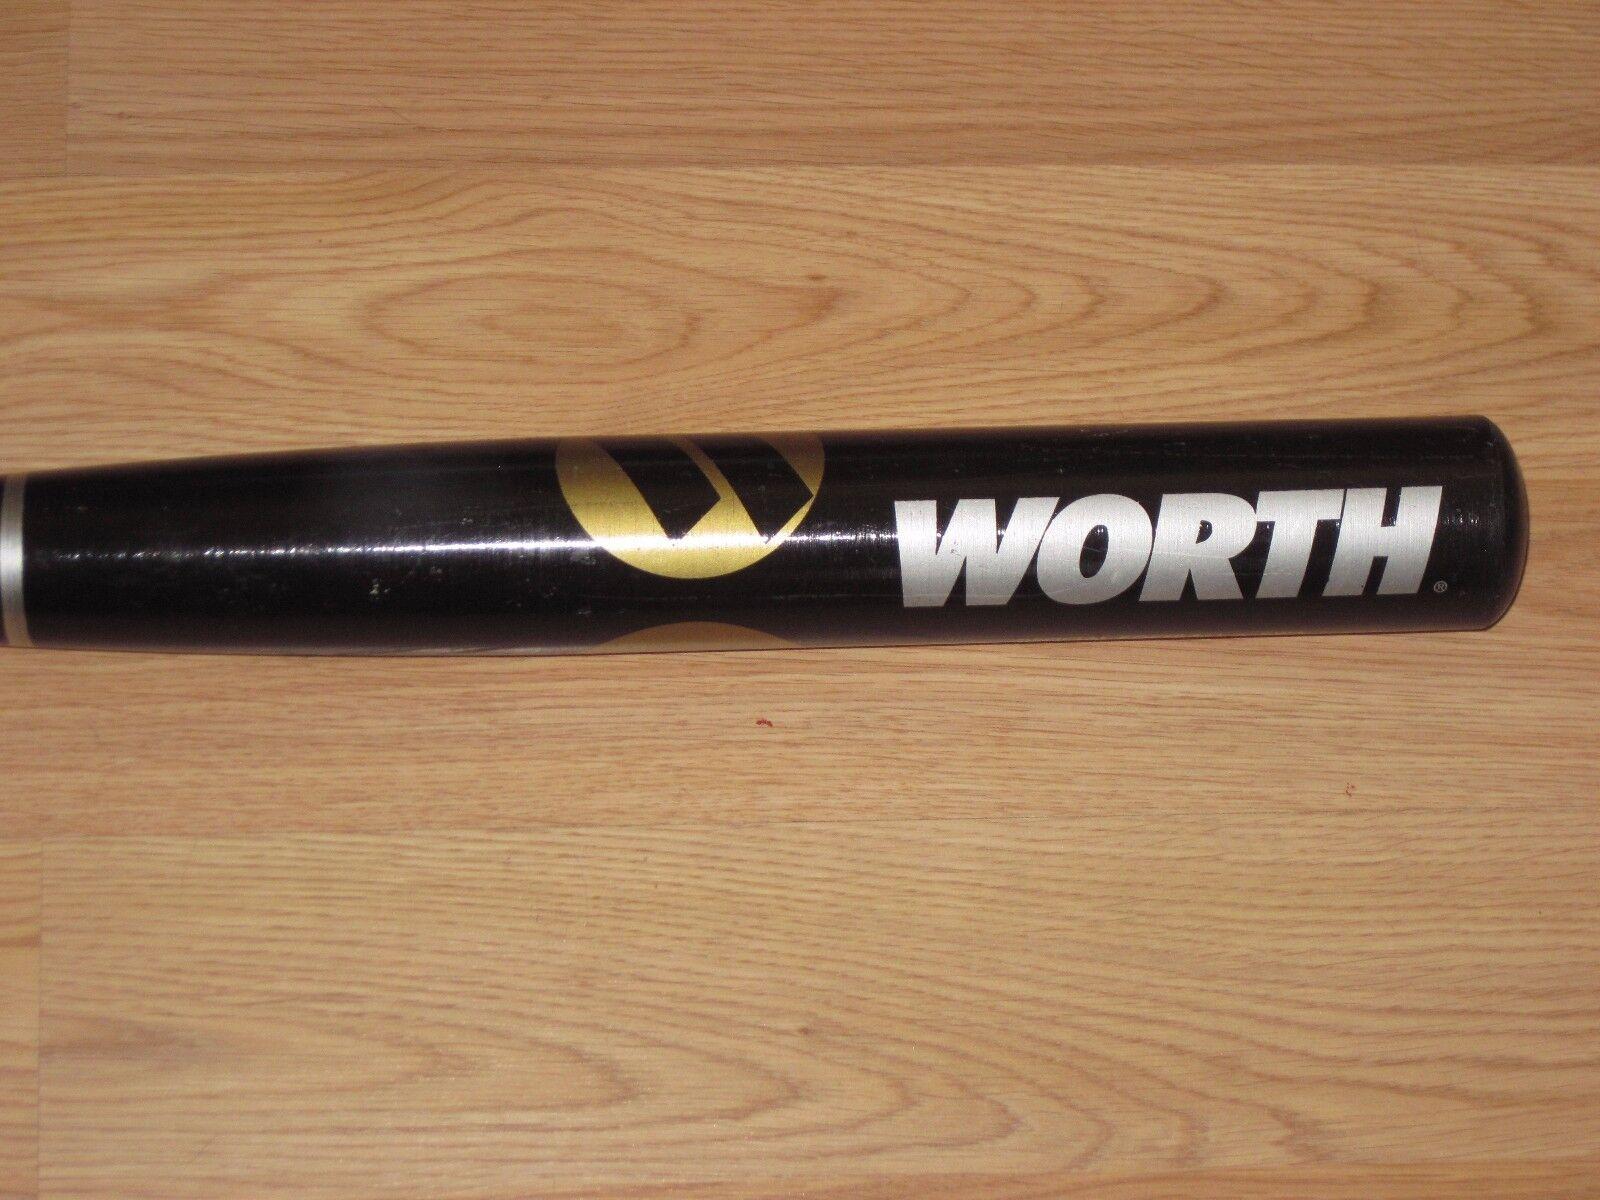 Vale la pena Softbol bate SW4 34  26oz Negro Usa Made in Tullahoma Tennessee   envío Gratis